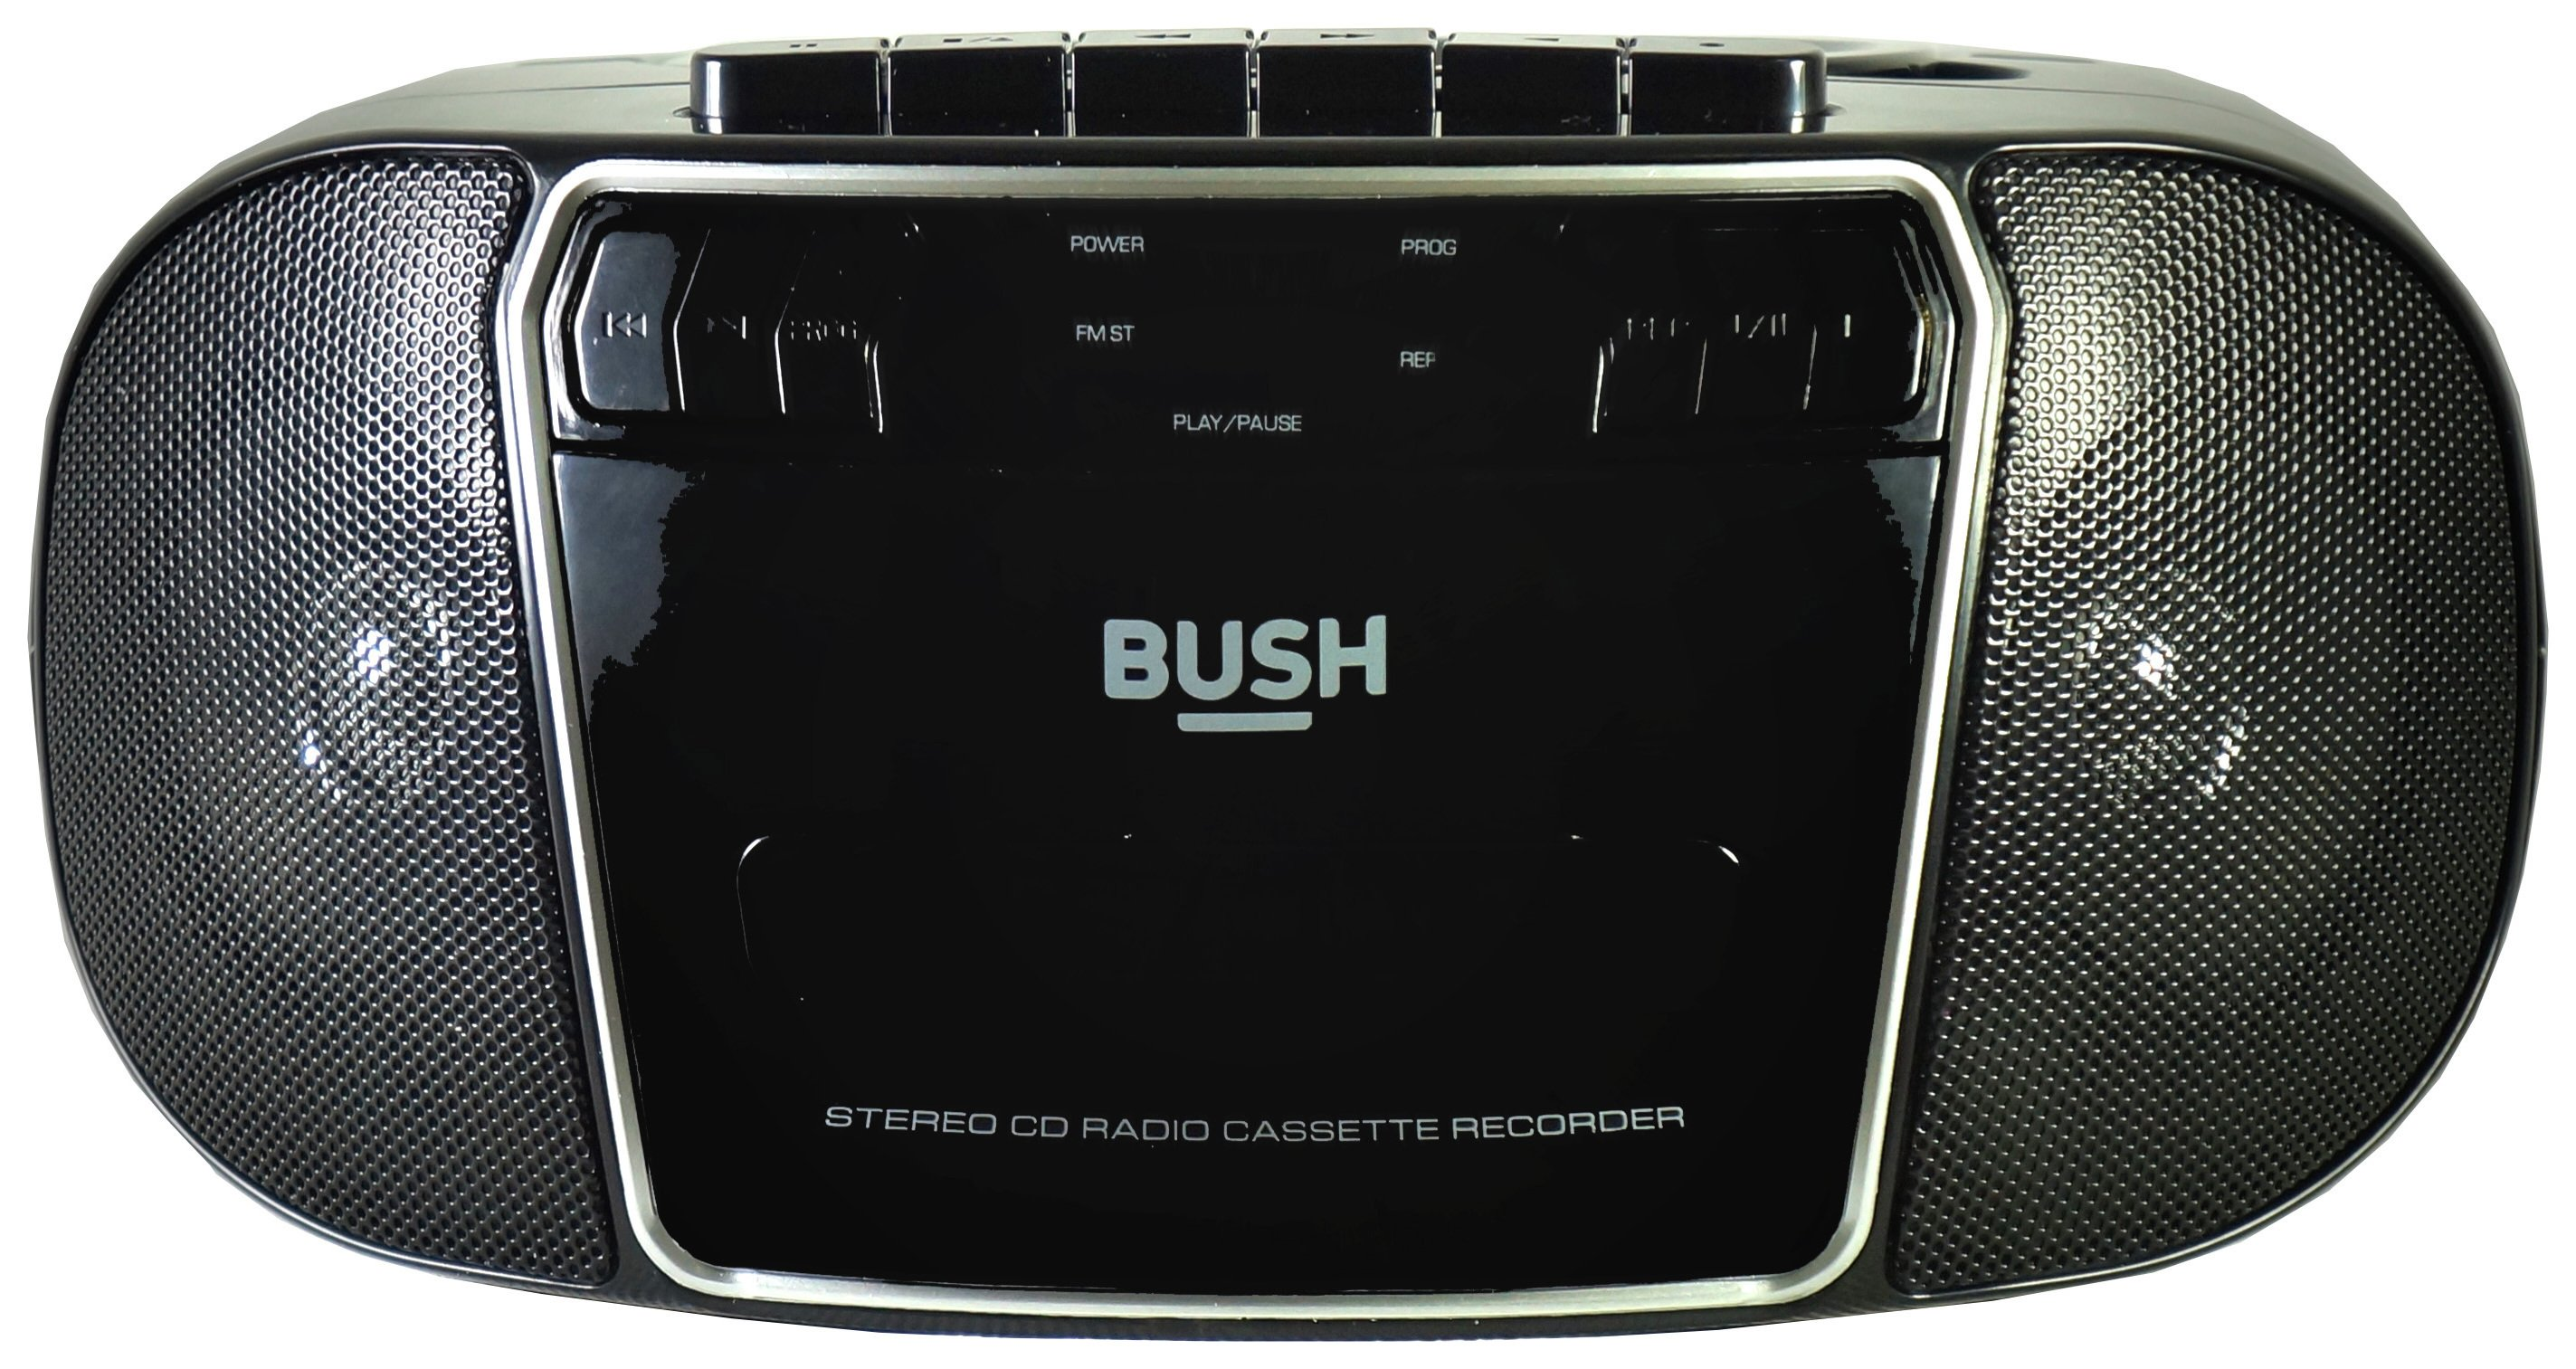 Bush Bush KBB500 CD Radio Cassette Boombox - Black/Silver.